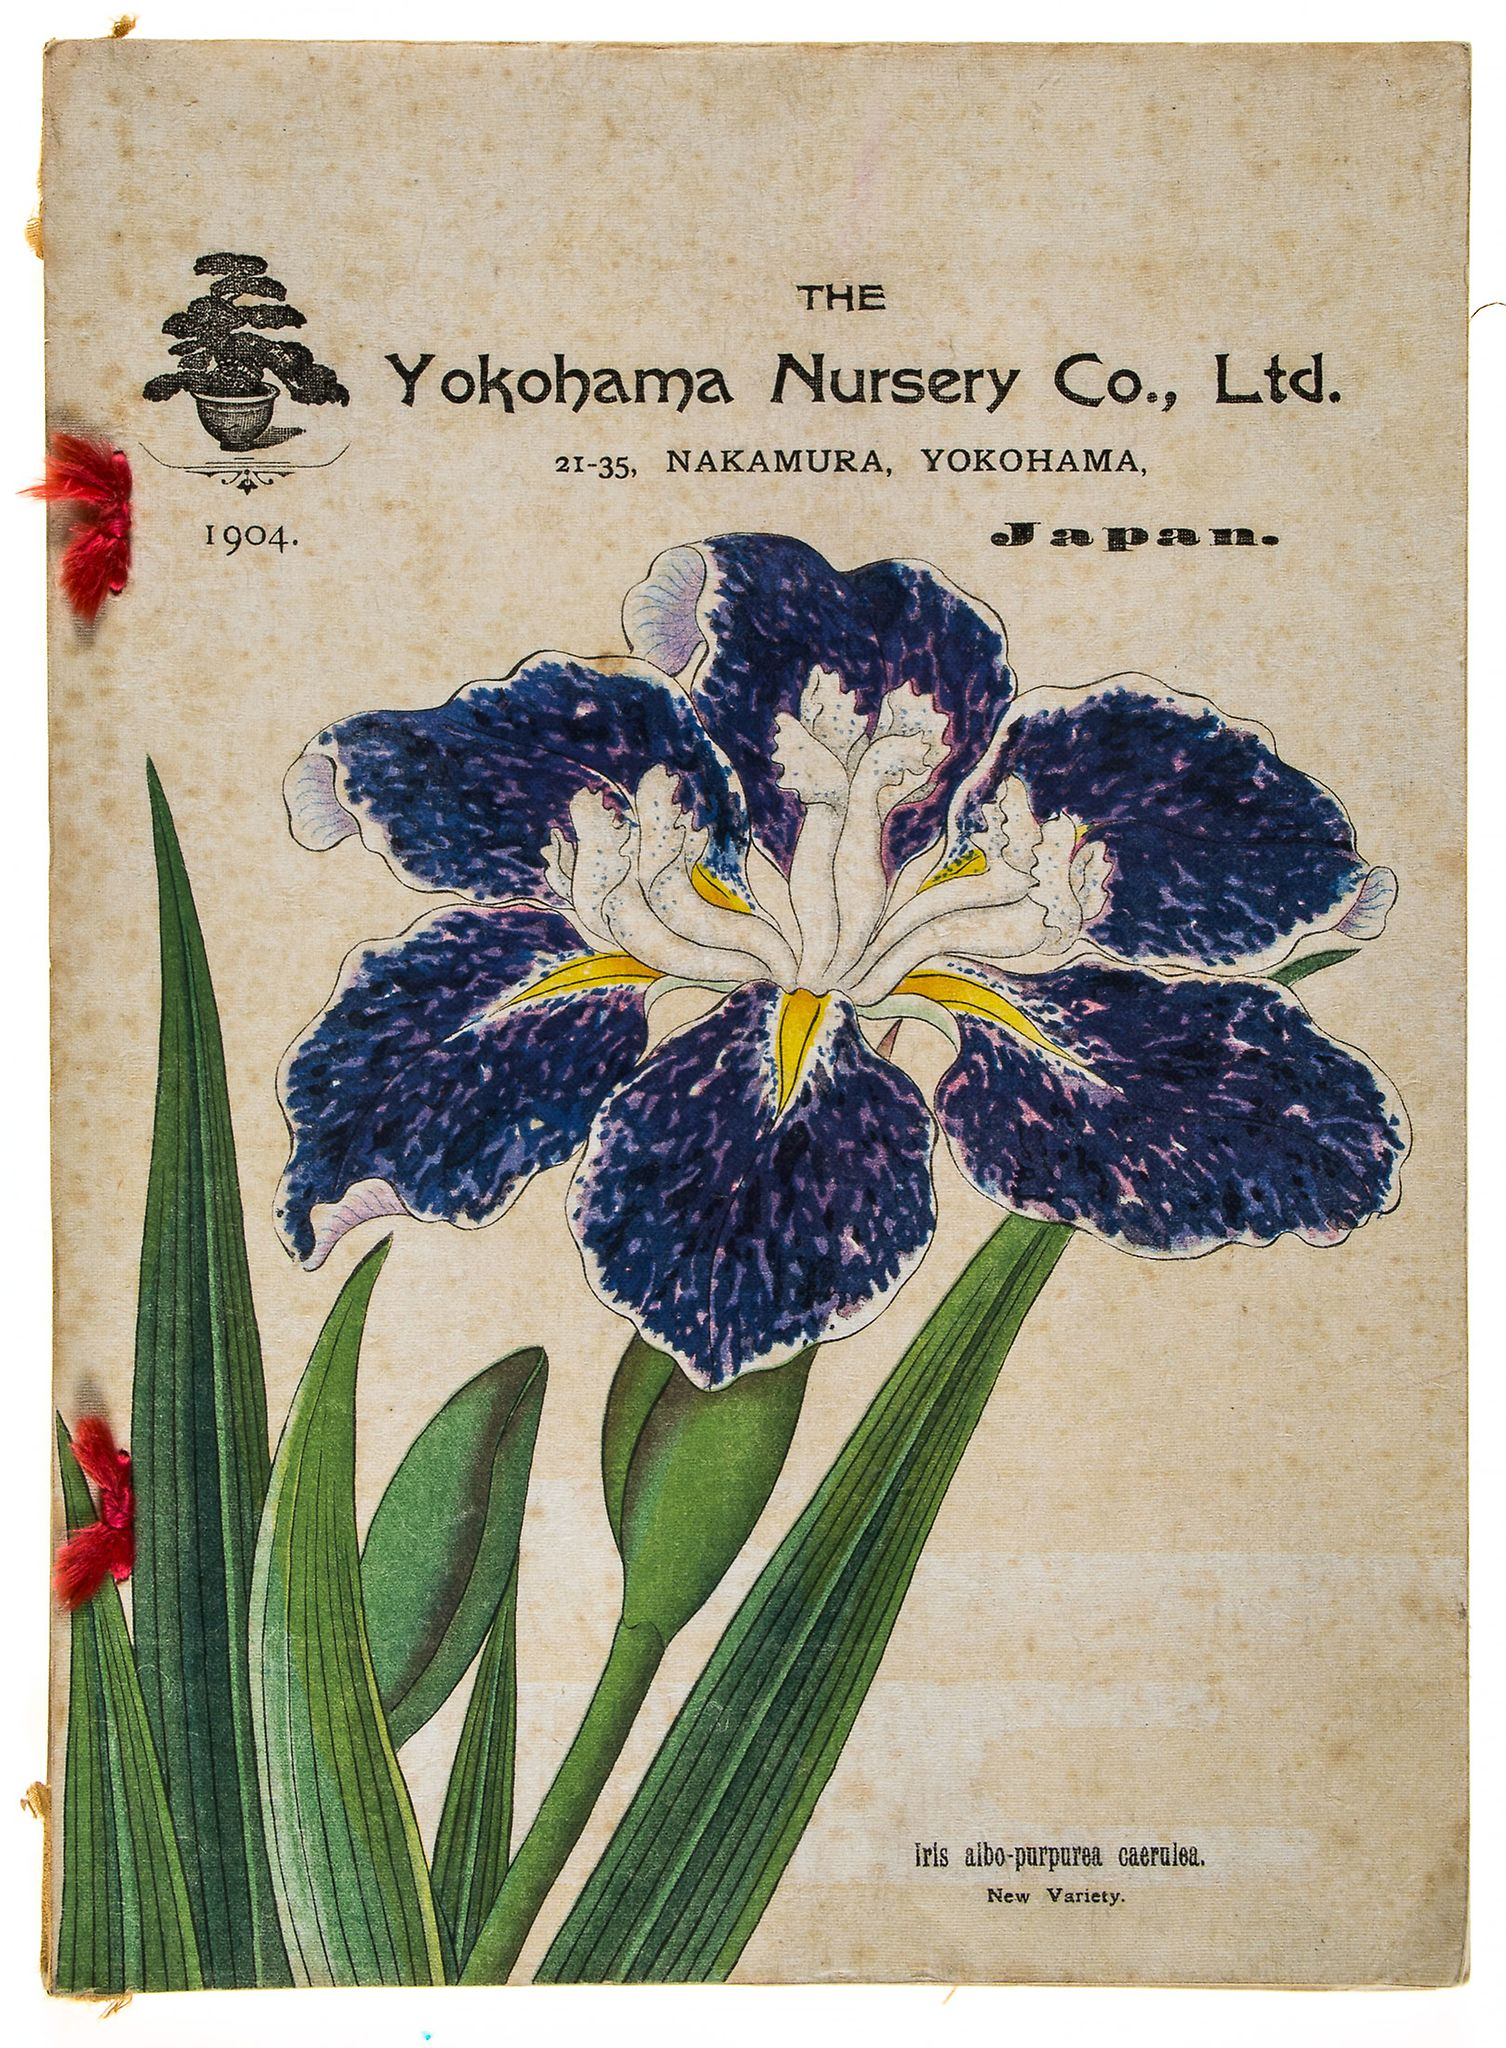 Yokohama Nursery Co., Ltd. - Descriptive Catalogue...for 1904,  illustrations including 11 full-page